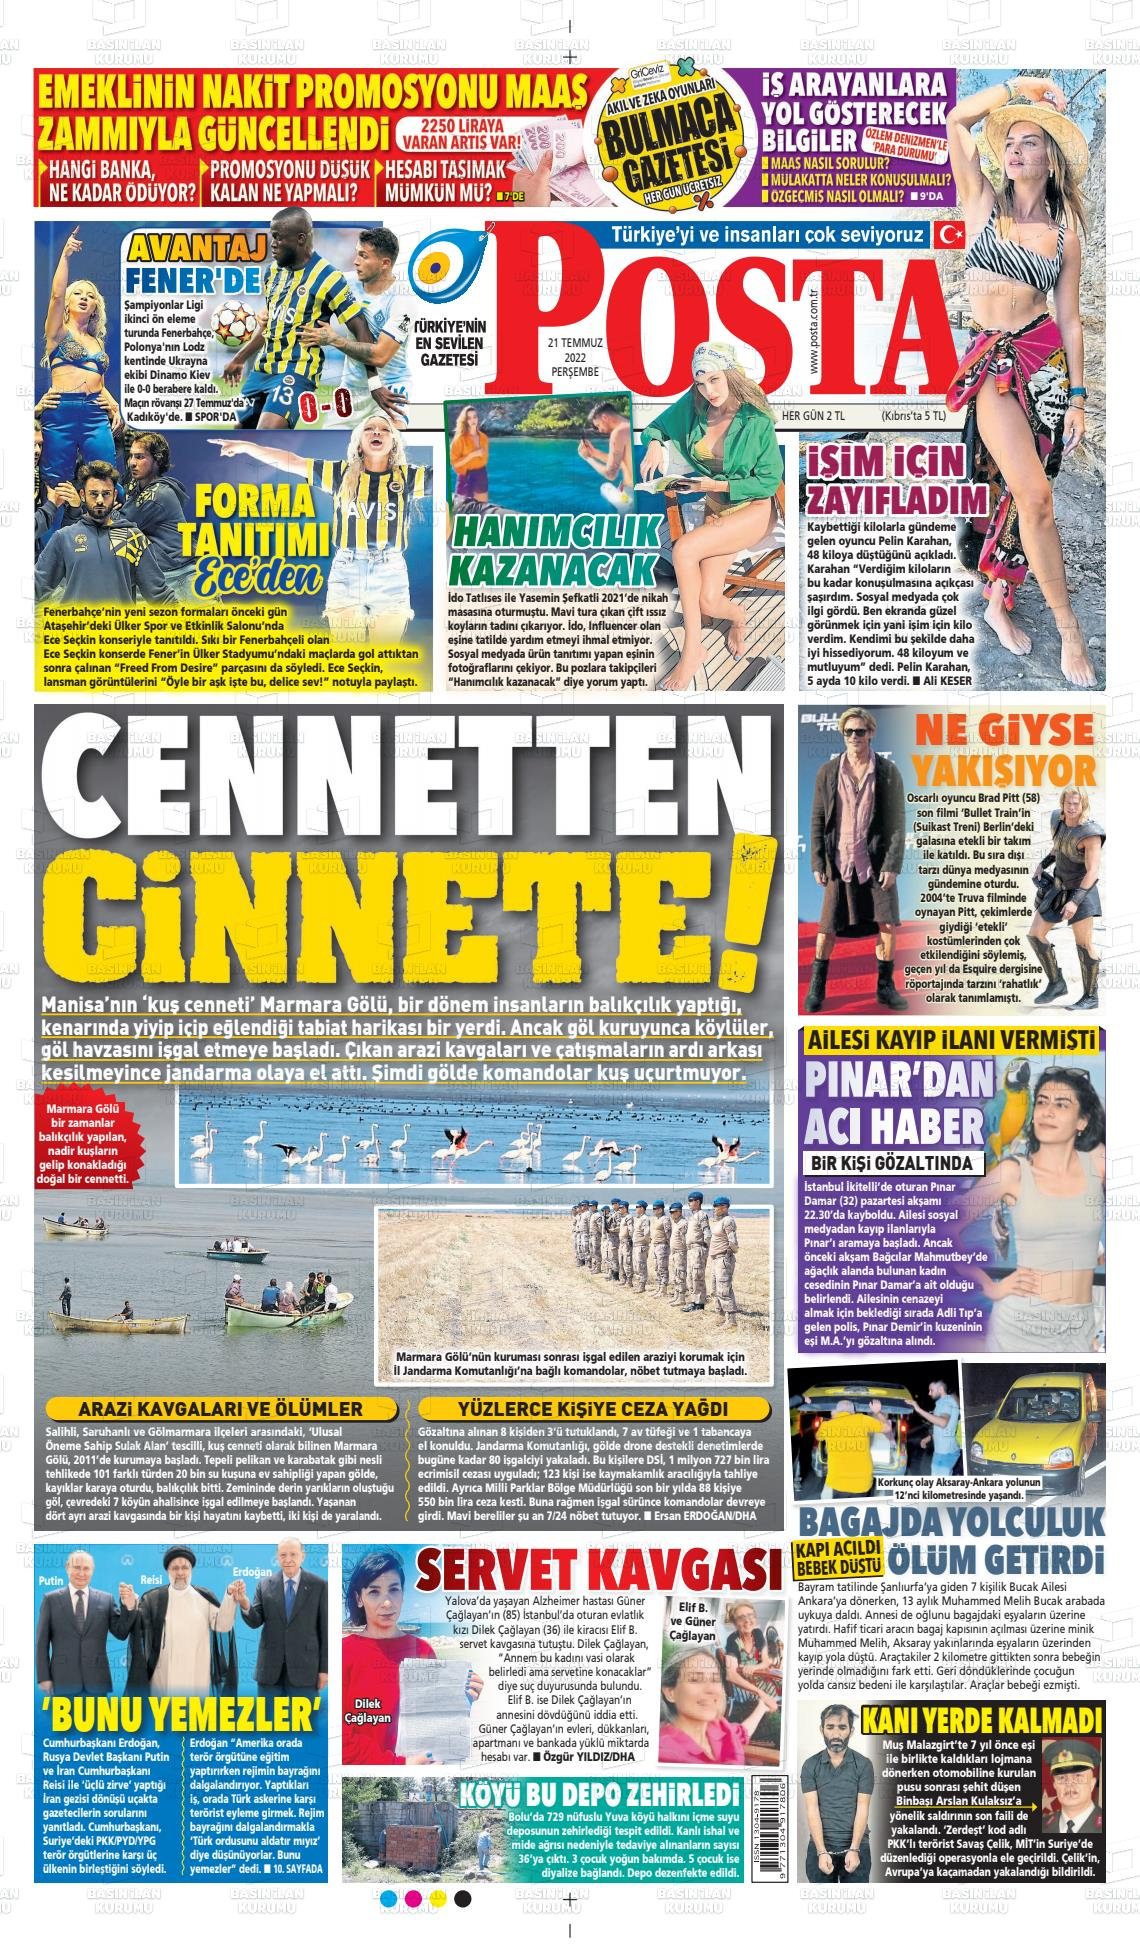 9 Temmuz 2020, Perşembe posta Gazetesi